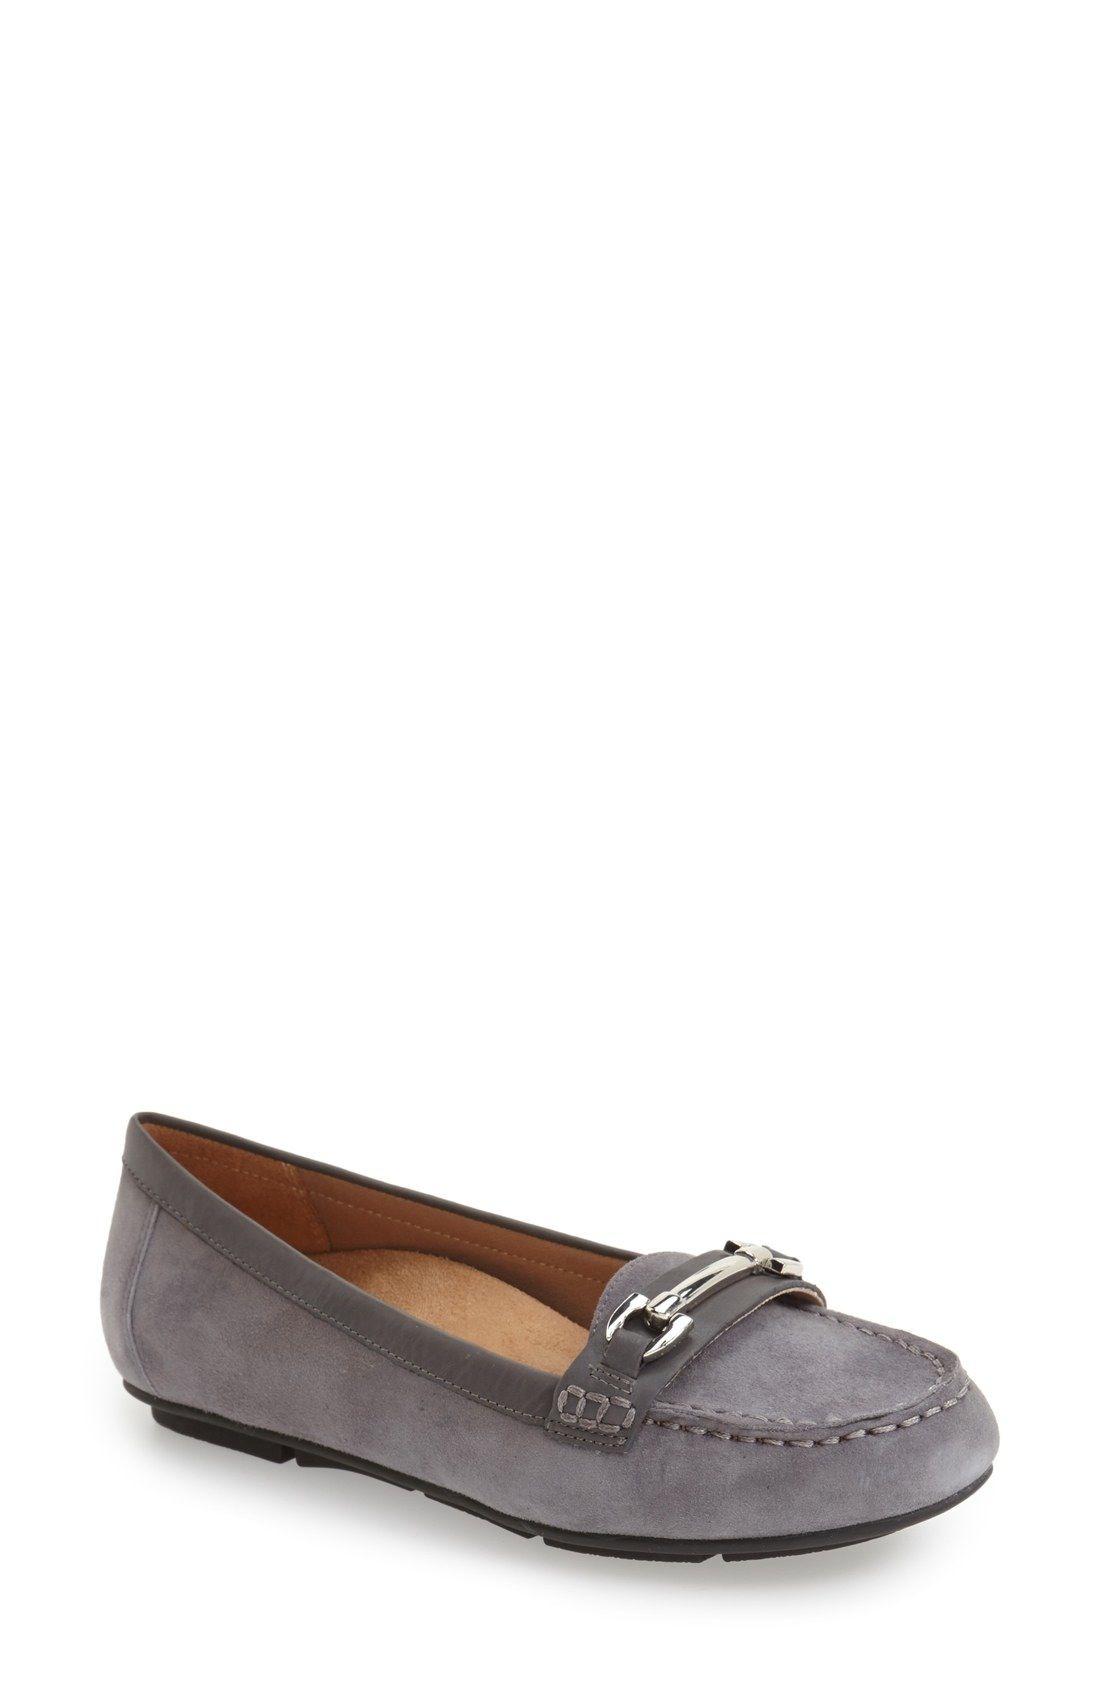 f12308582ef Vionic  Kenya  Orthaheel® Loafer (Women) available at  Nordstrom ...